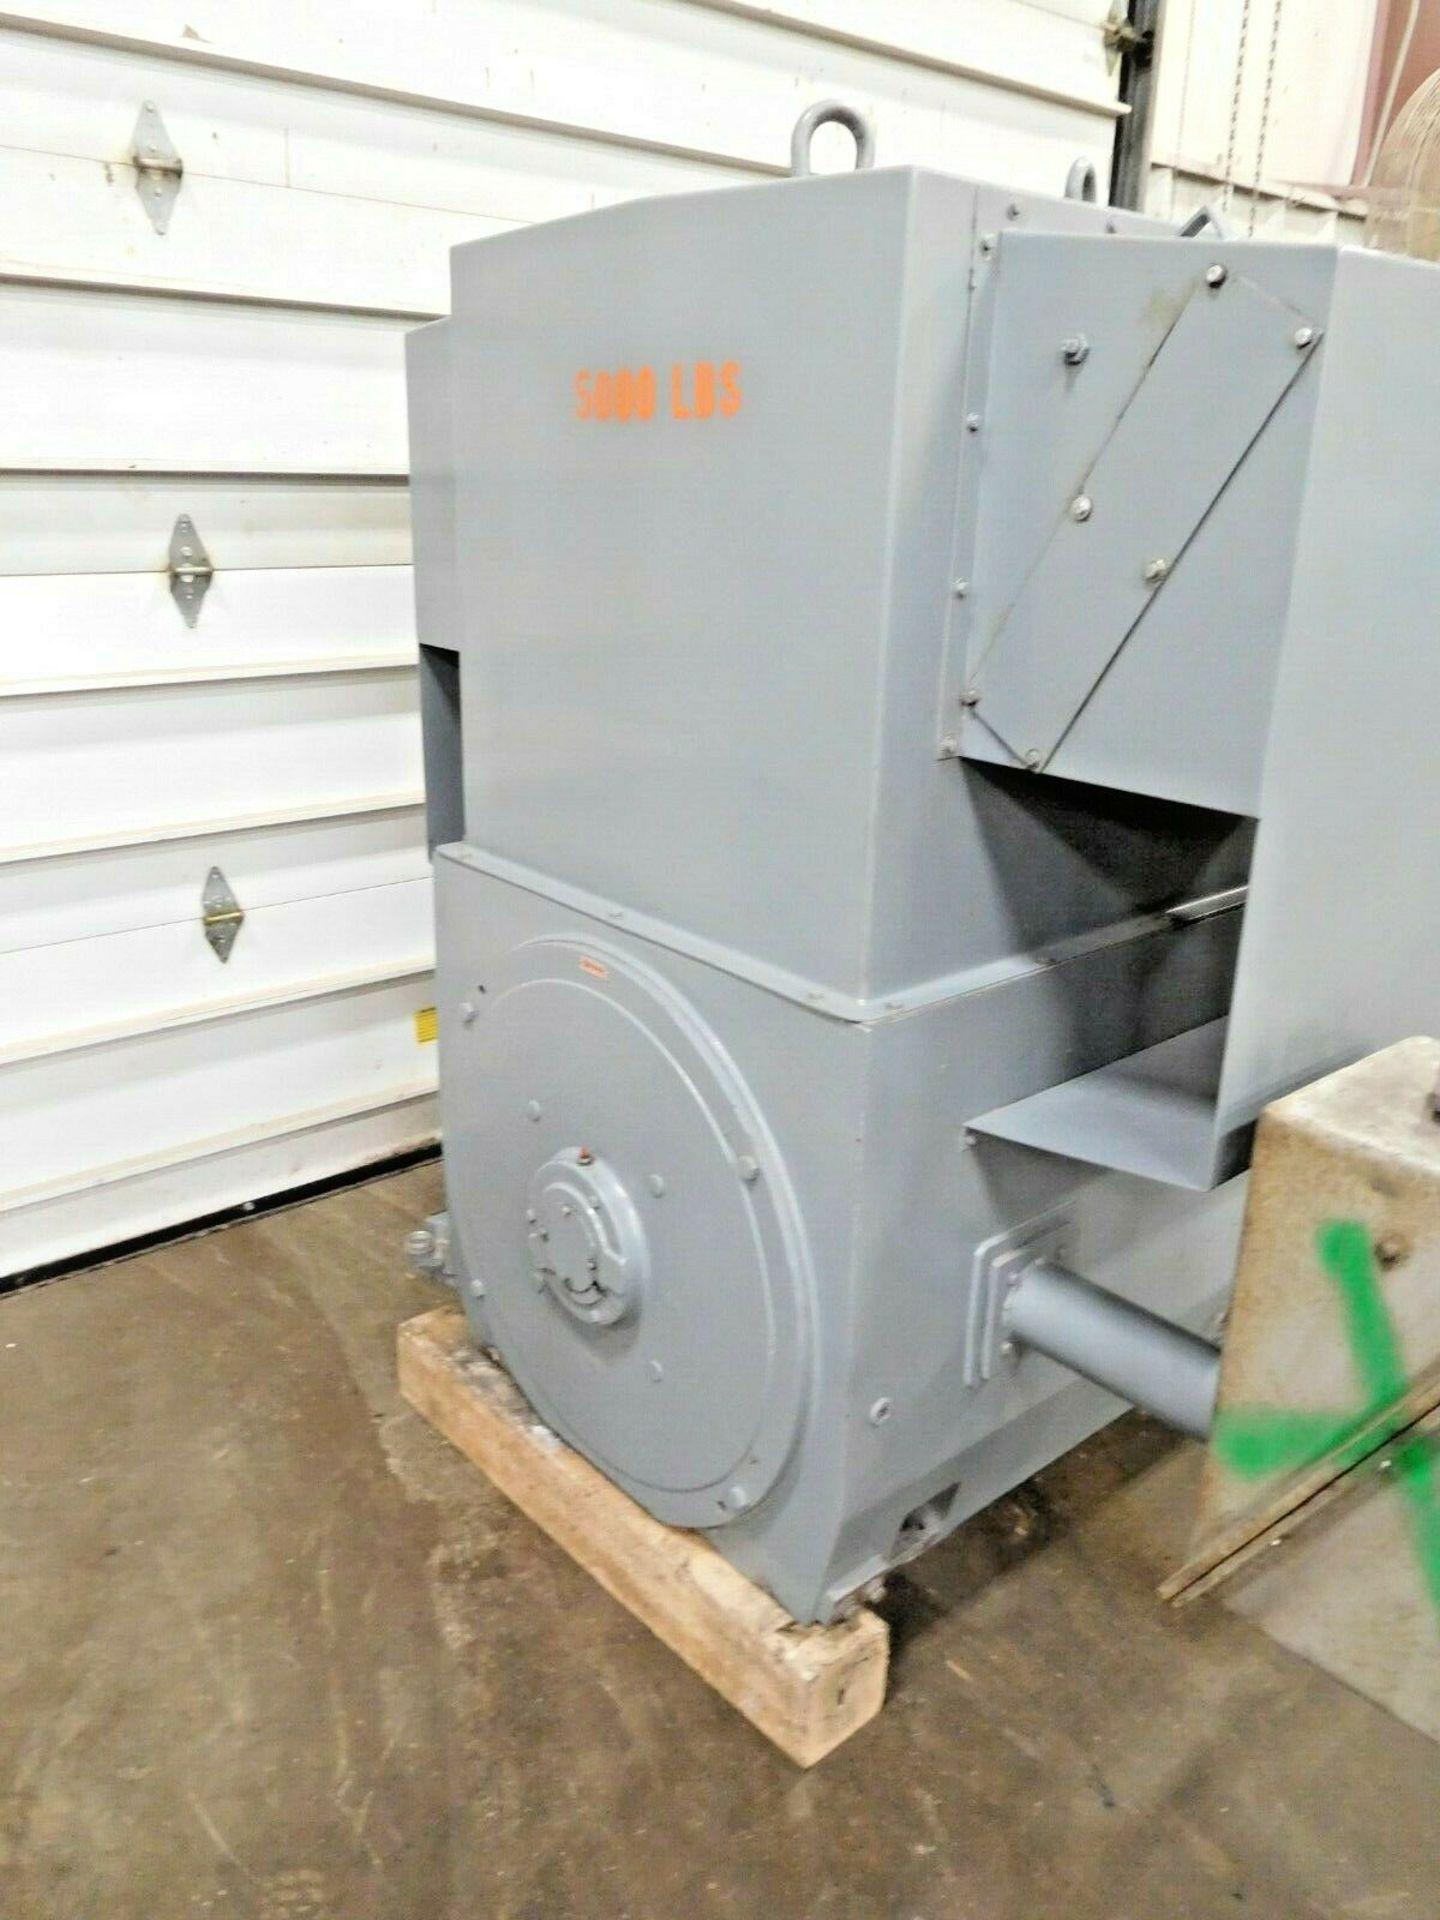 Siemens 1000 HP Induction Motor. 3 Ph. 3570 RPM. 4000 V. 60 Hz. 588US. FODS. - Image 3 of 4